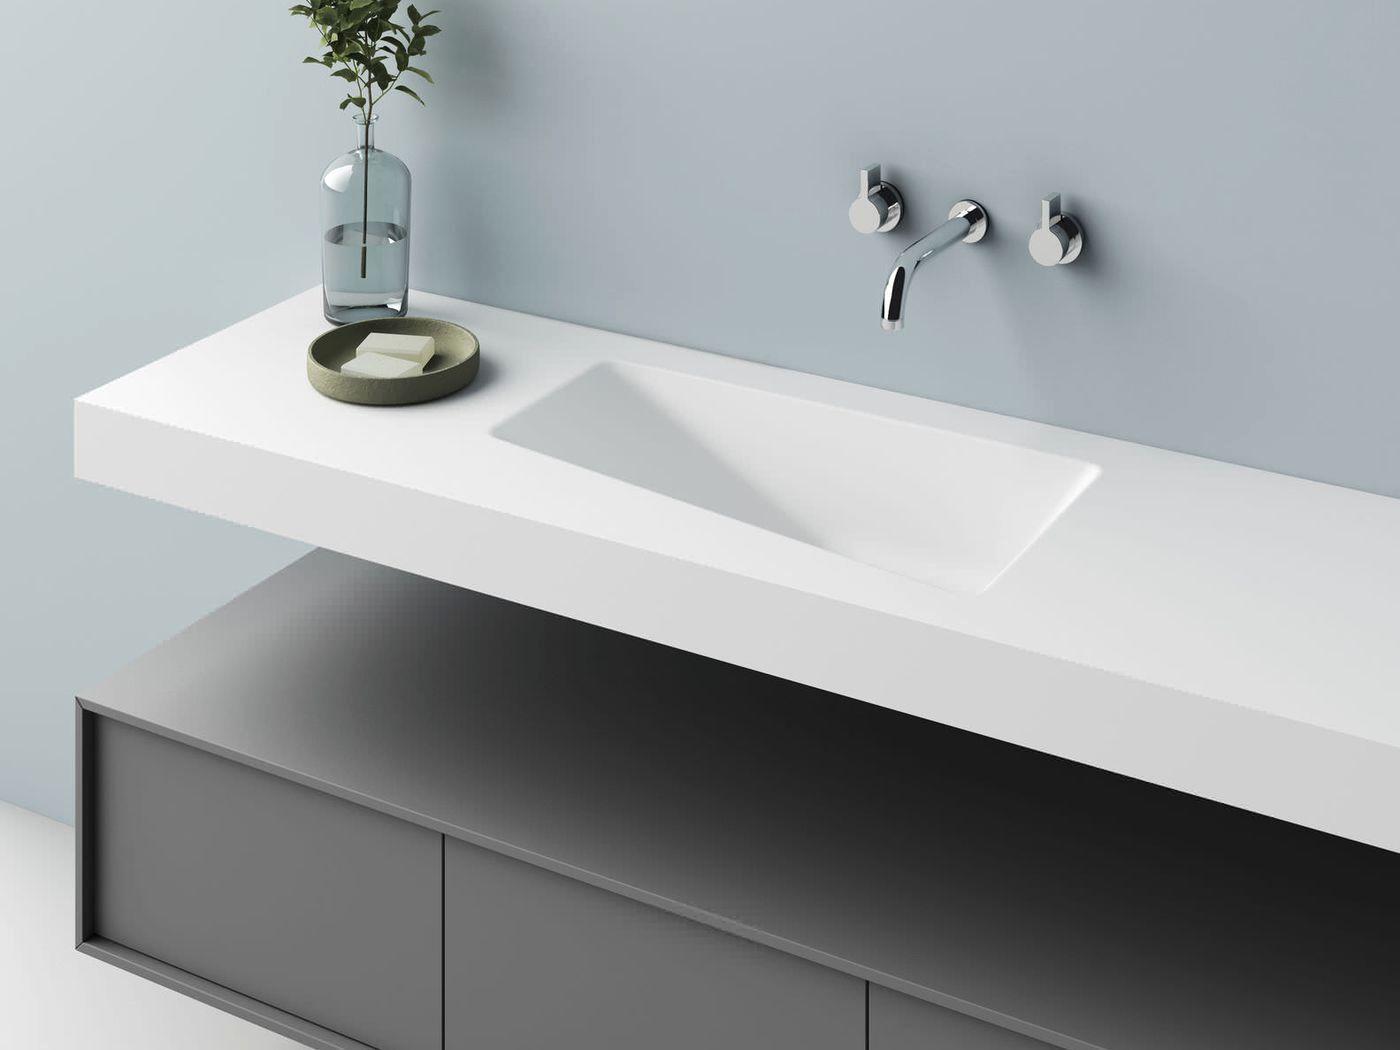 Plan Vasque Sur Mesure plan vasque sur mesure frais plan vasque poser best vasque